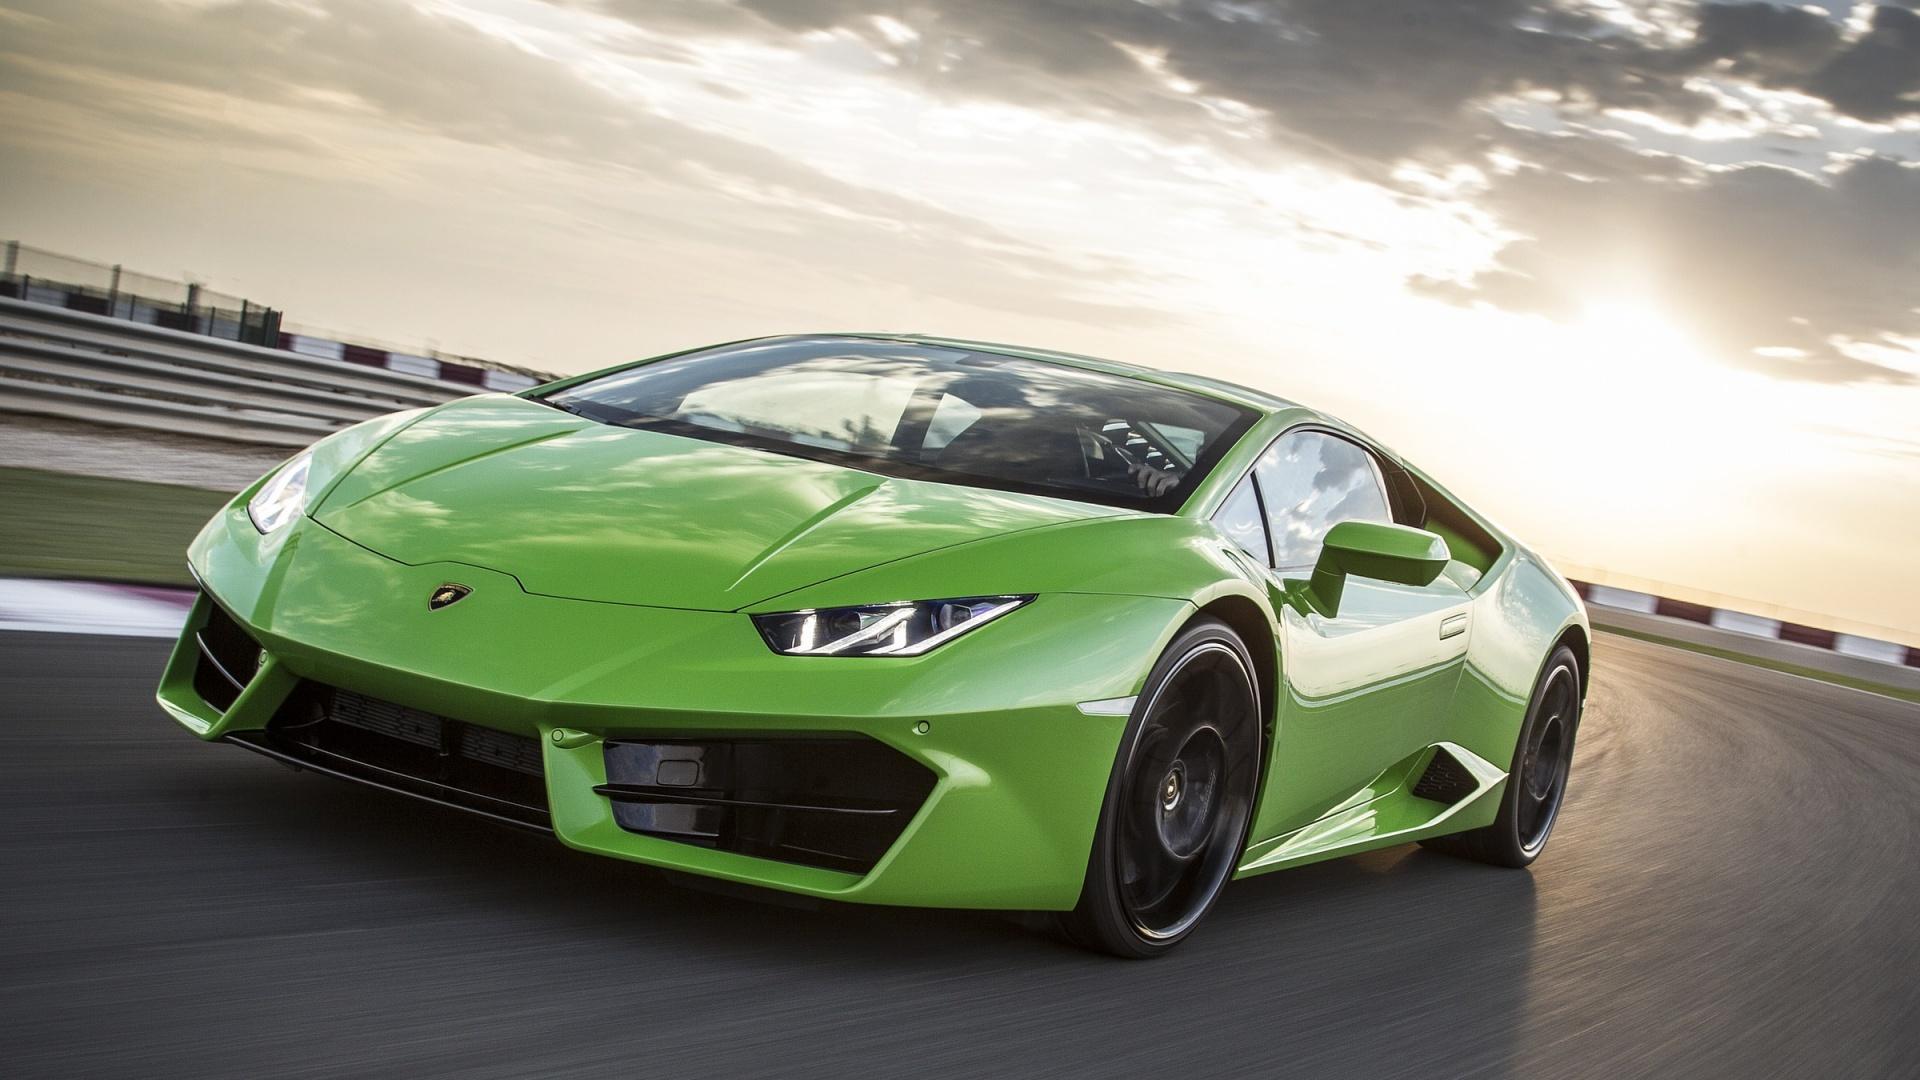 Green Lamborghini Huracan Lp580 2 2017 Wallpapers 1920x1080 535510